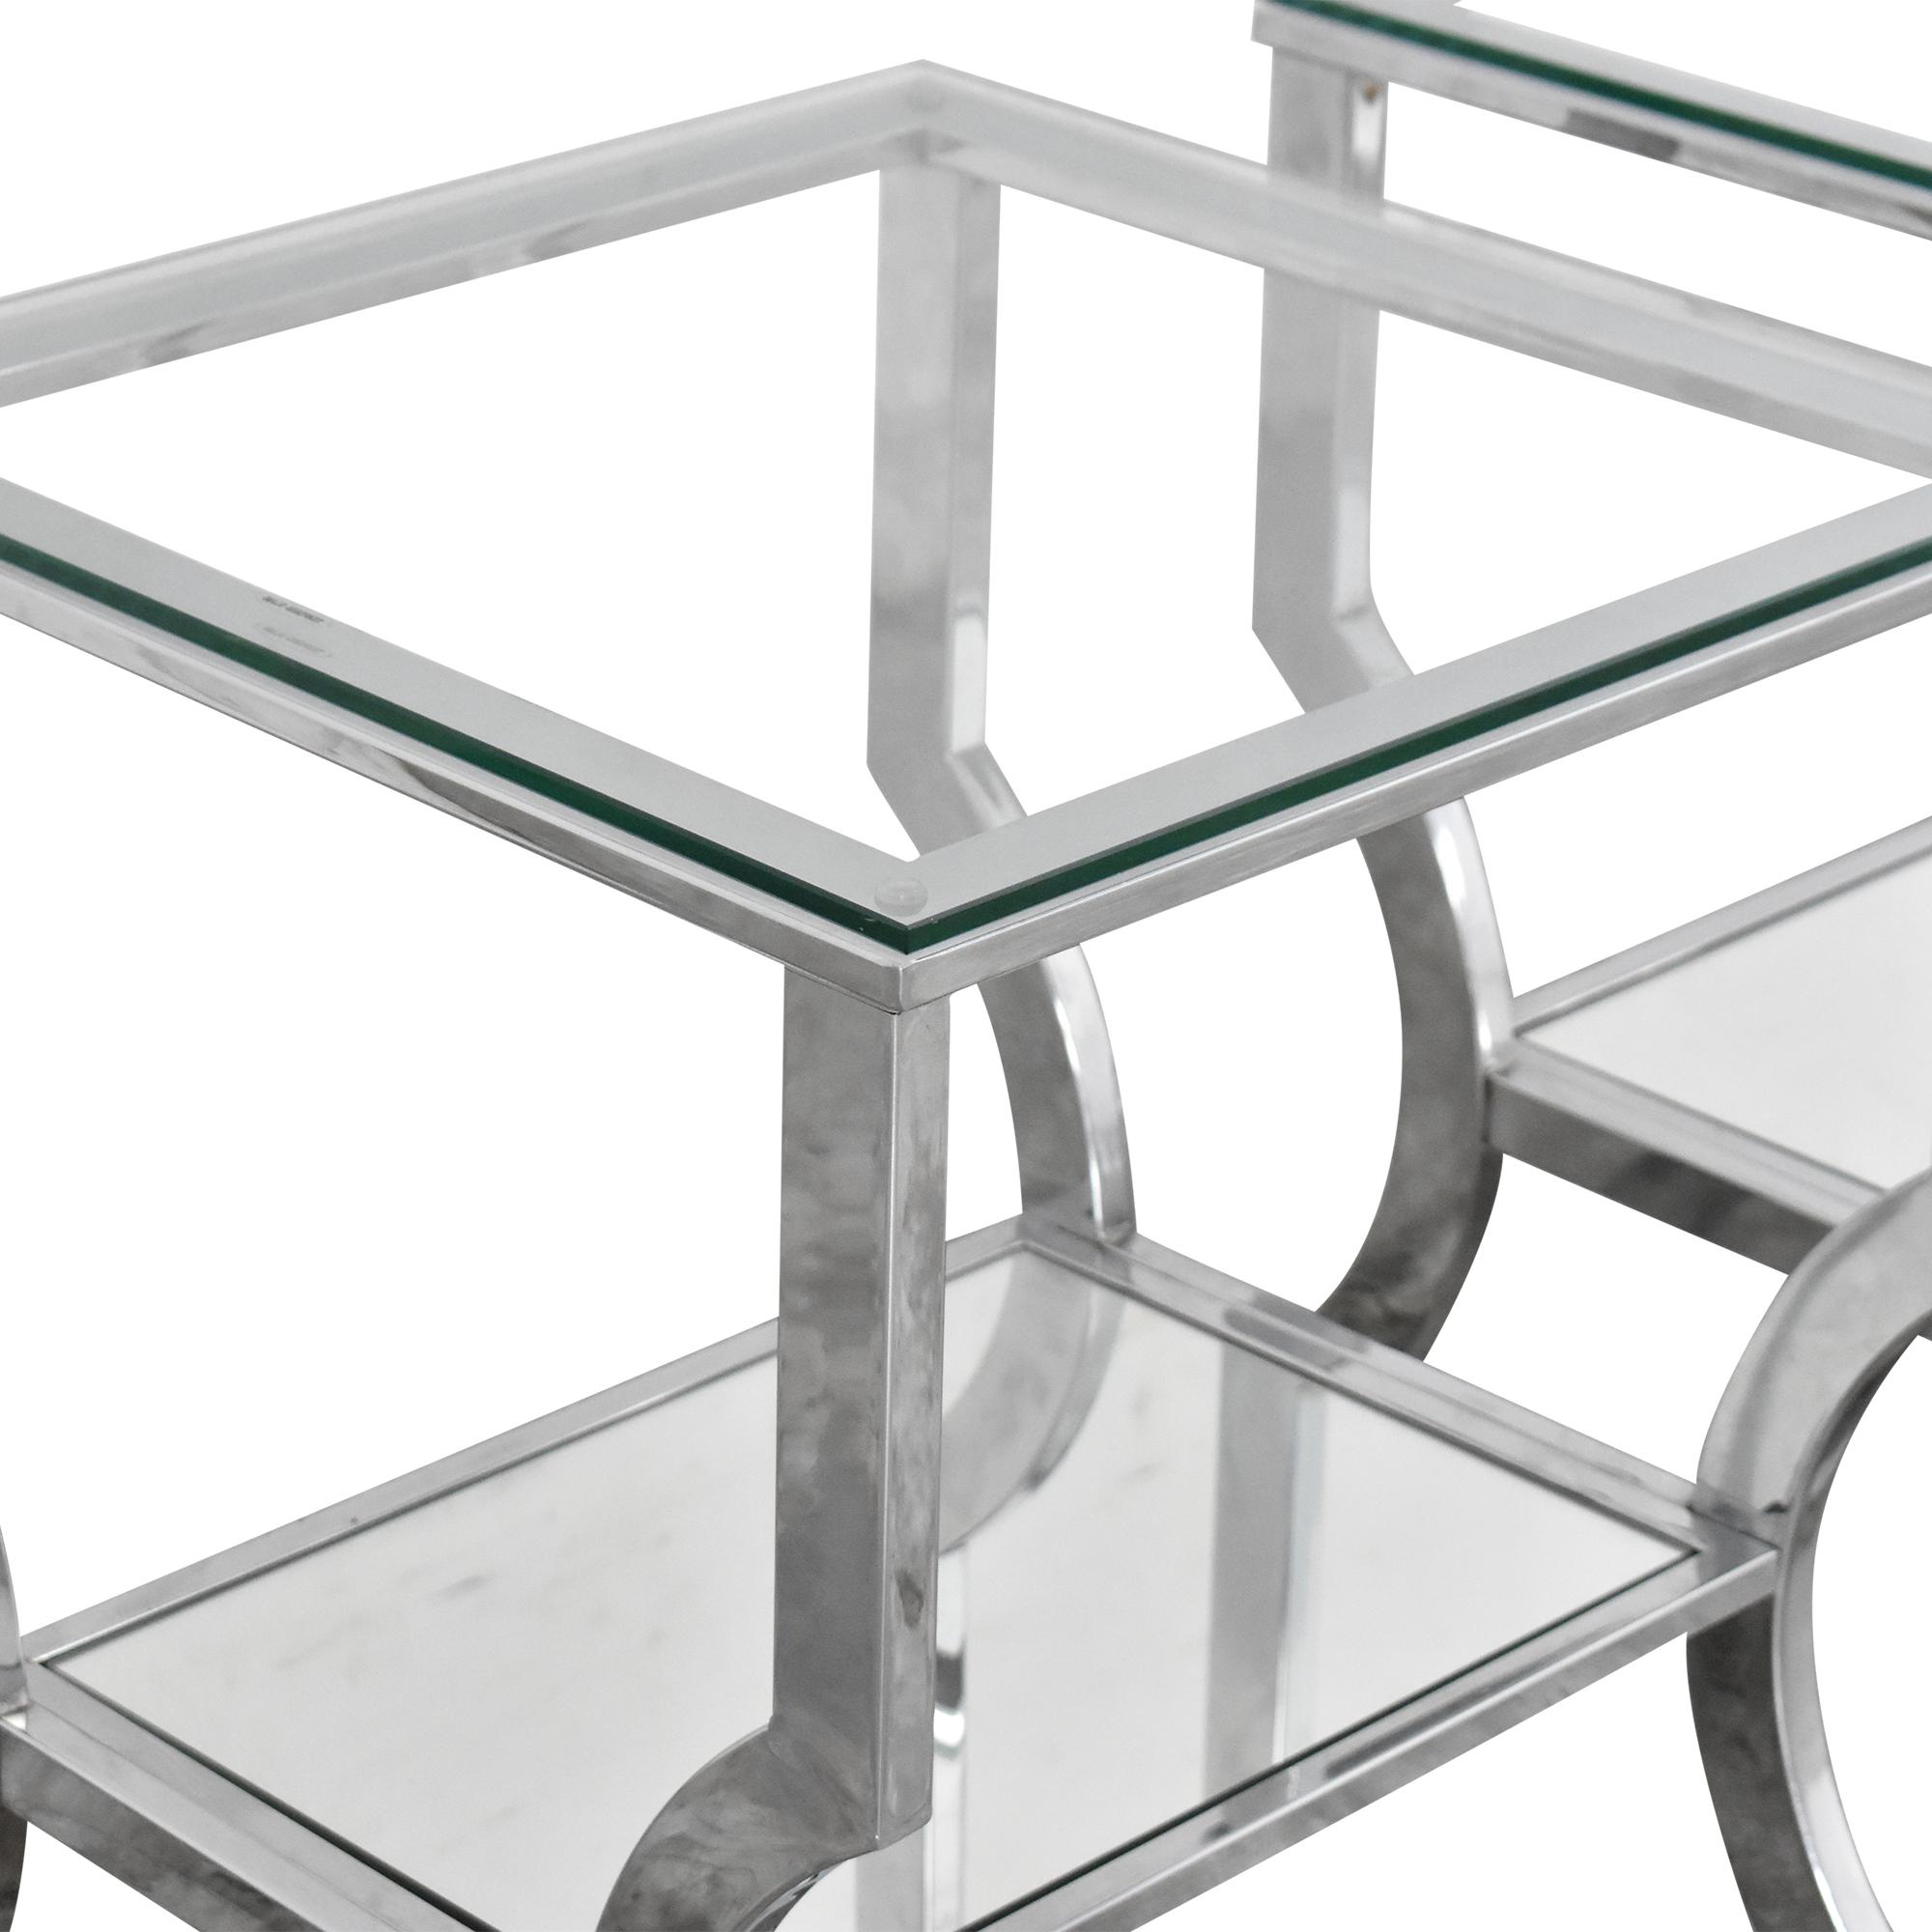 Transparent End Tables price